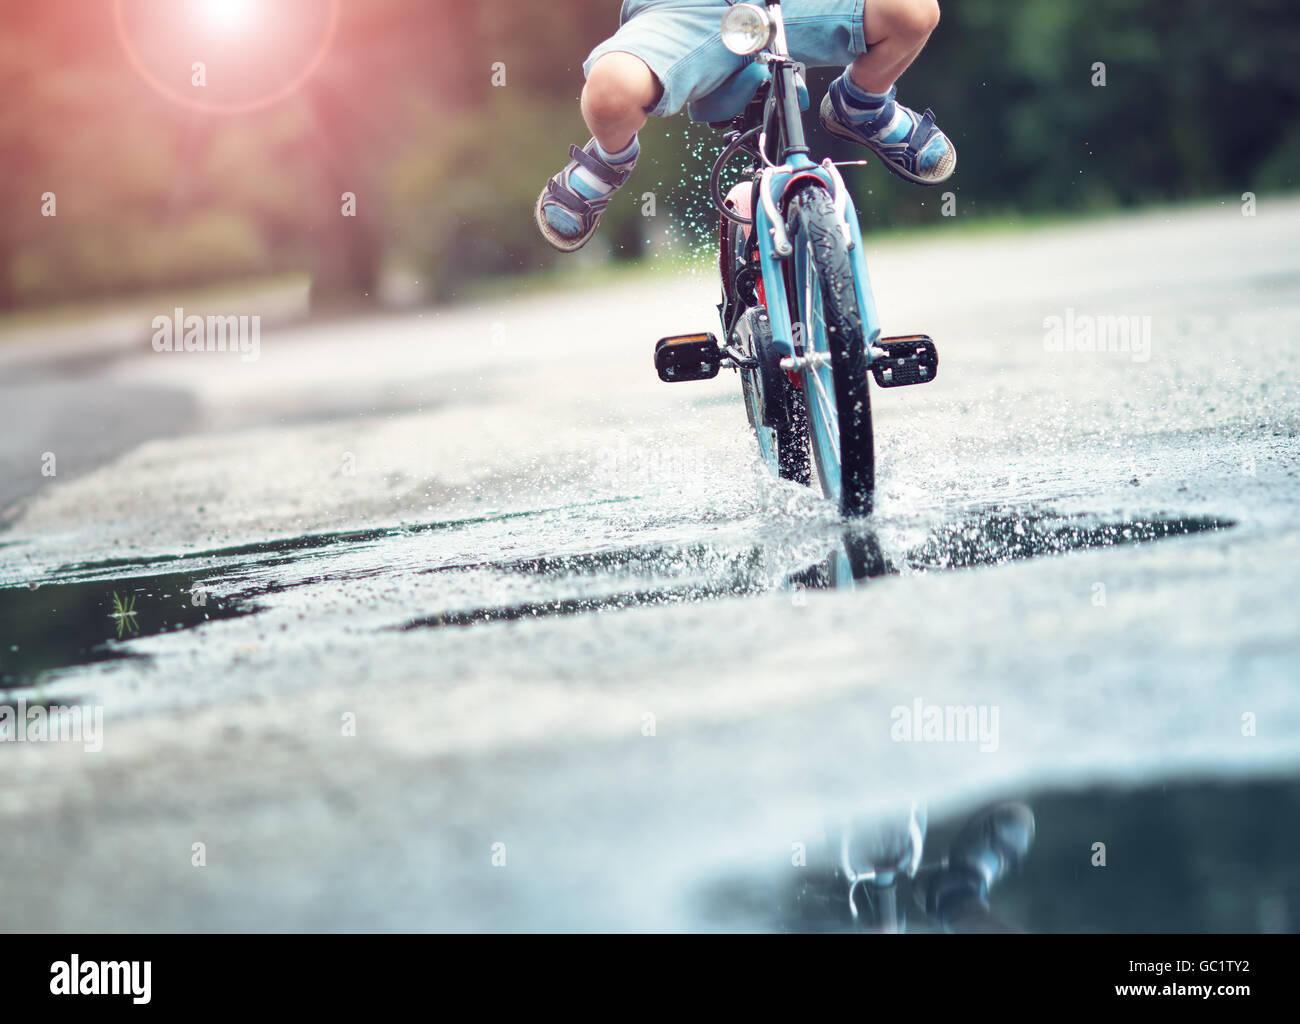 Kind auf dem Fahrrad Stockbild